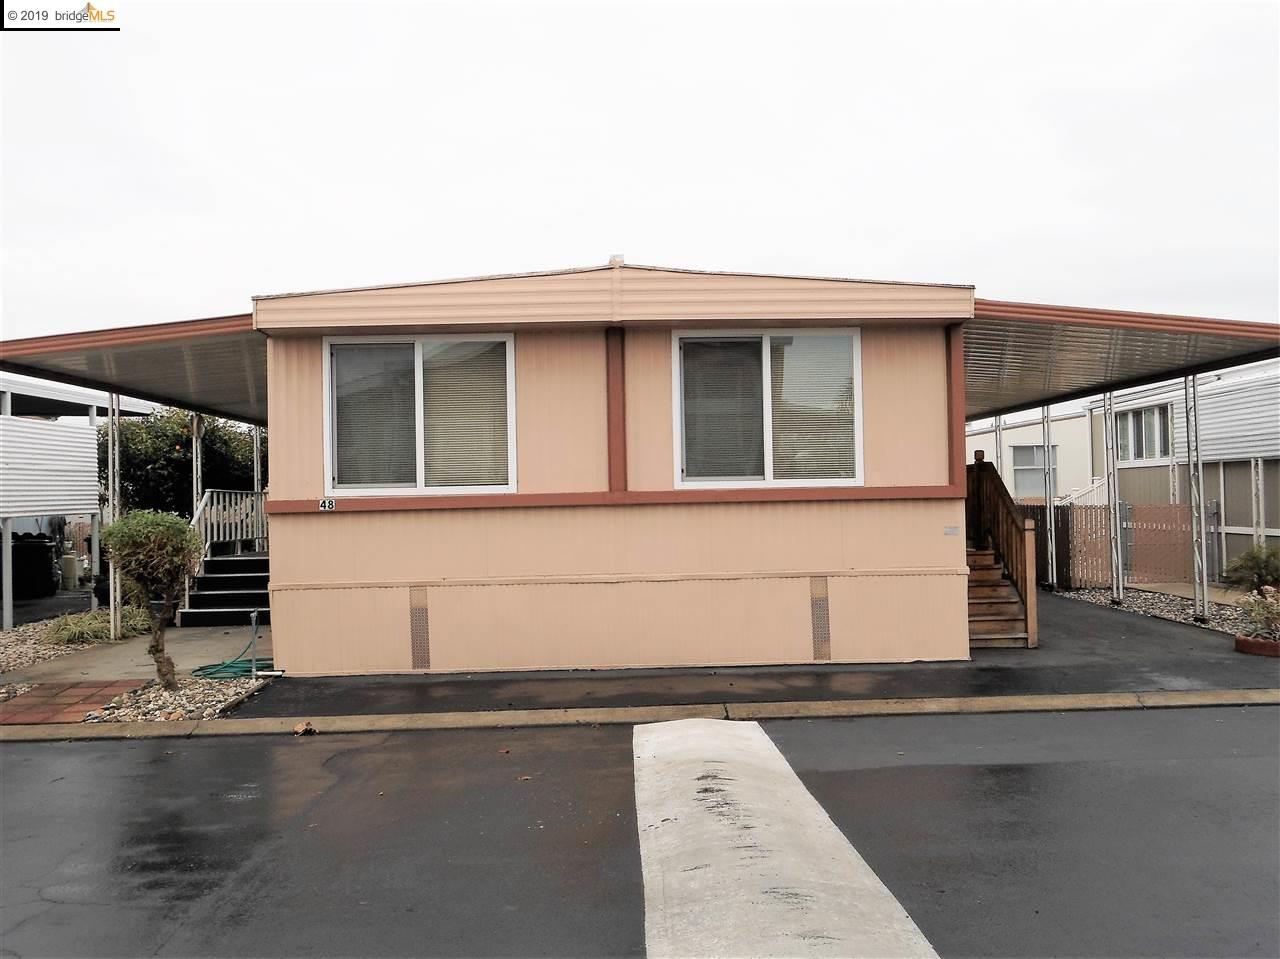 3660 Walnut Blvd. Brentwood, CA 94513